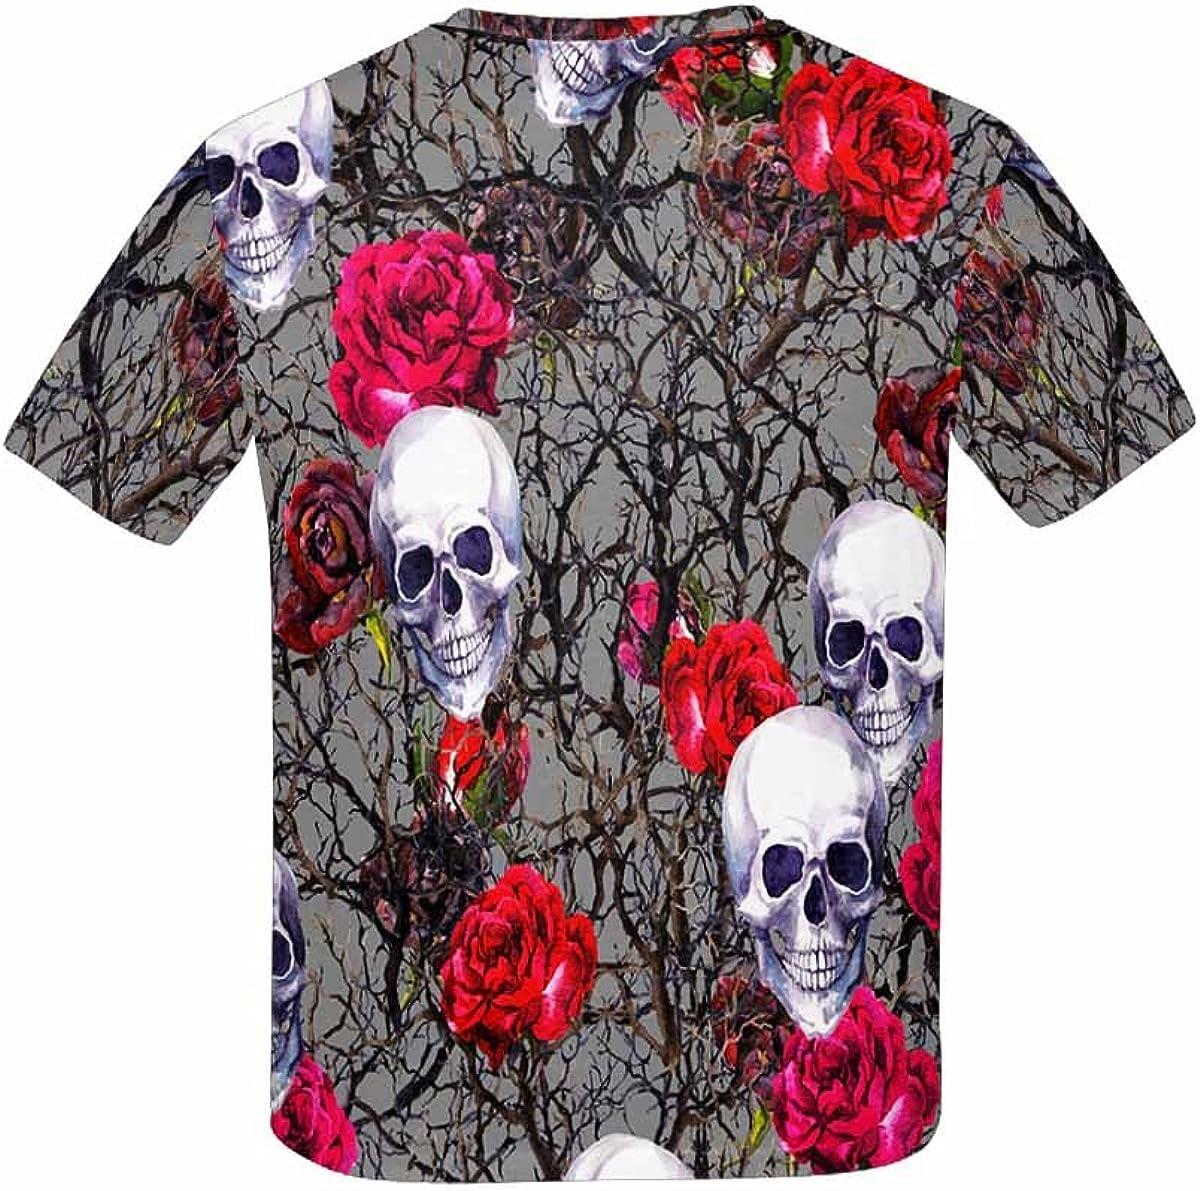 INTERESTPRINT Kids T-Shirts Skulls Rose Flowers and Branches Pattern XS-XL